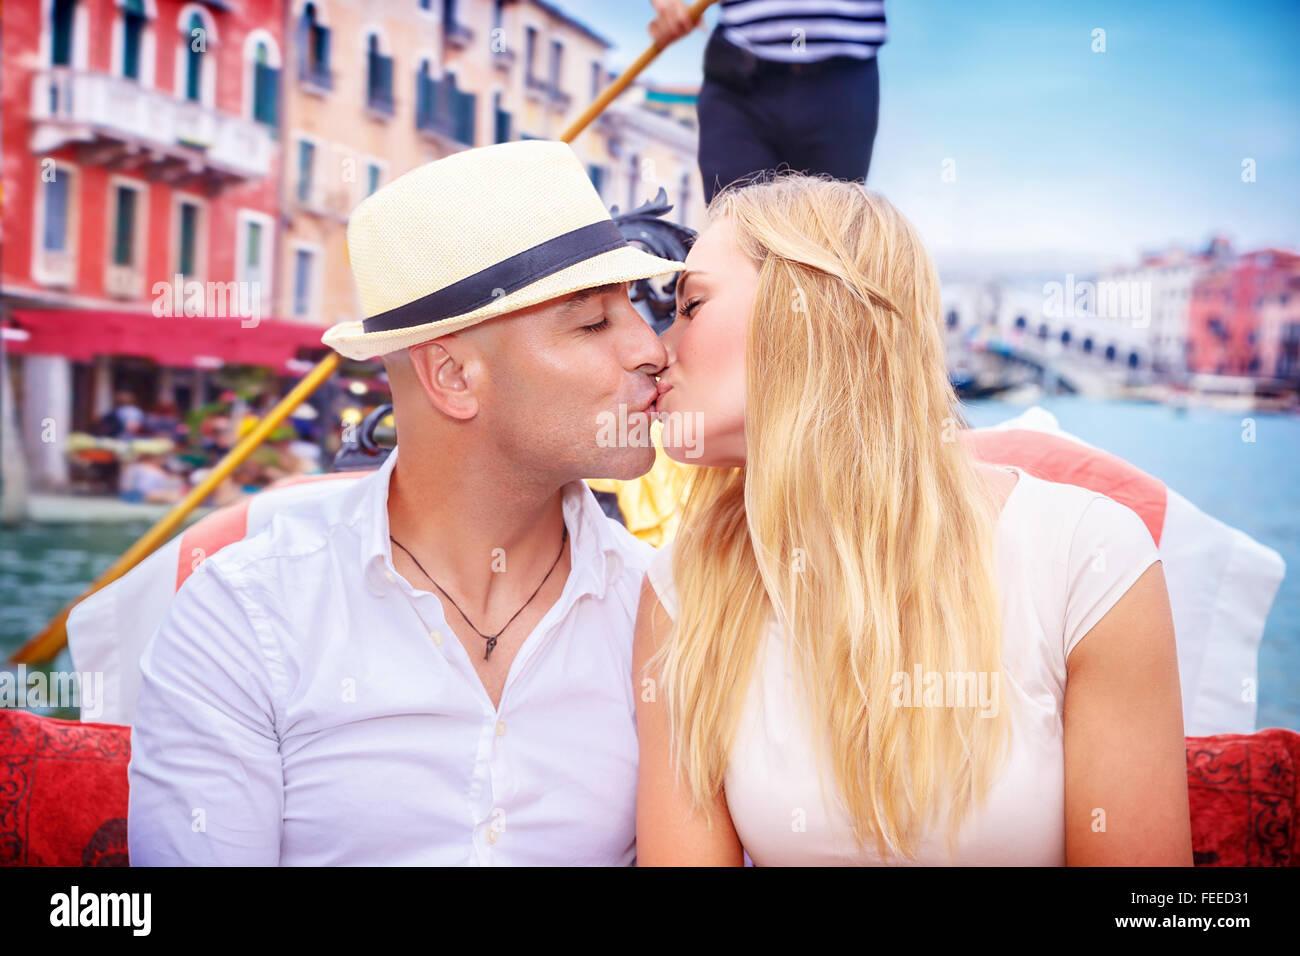 Portrait of happy loving couple in romantic honeymoon, kissing on a gondola, vacation in Italy, enjoying holidays - Stock Image